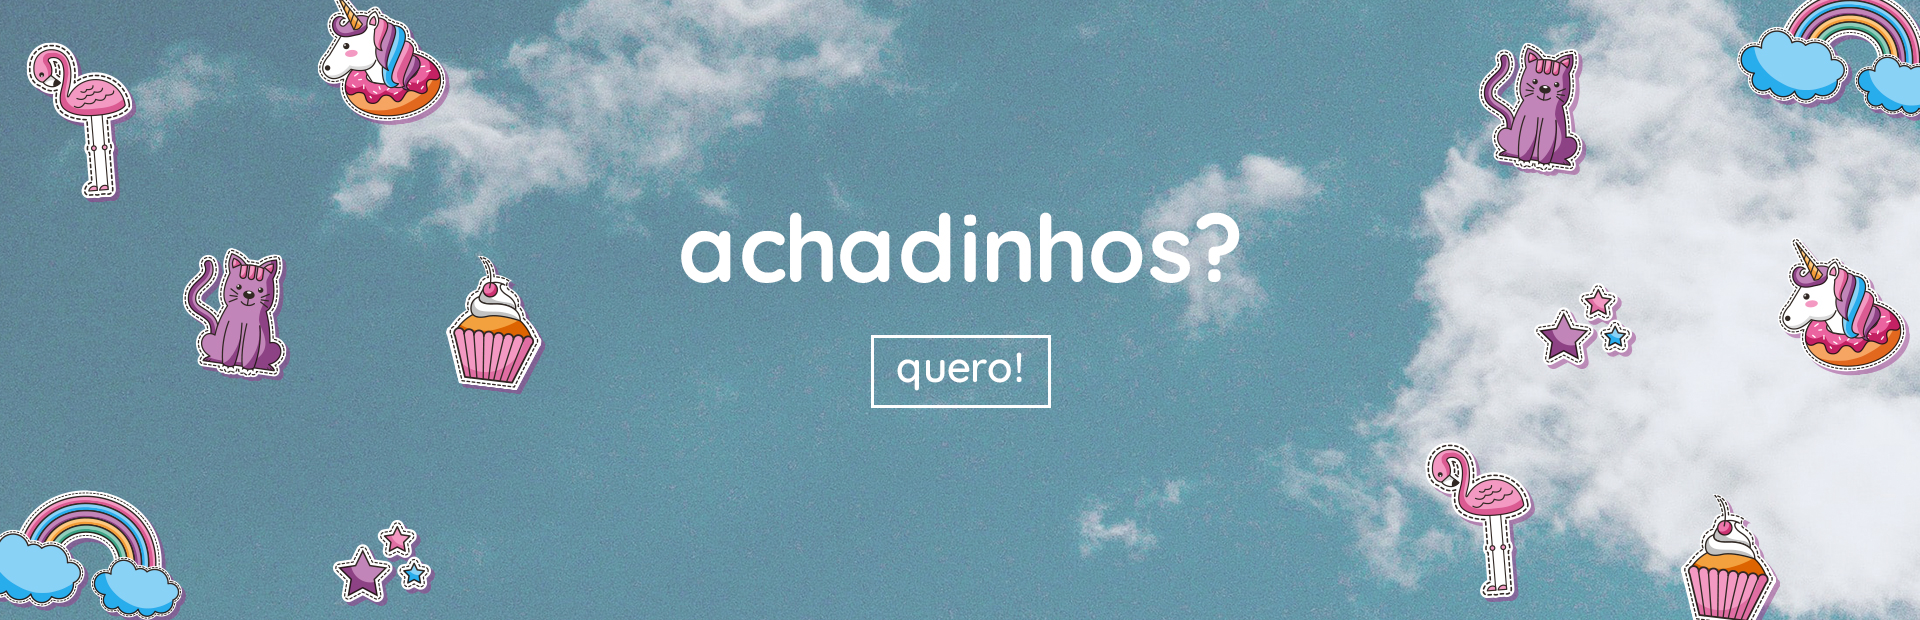 Achadinhos